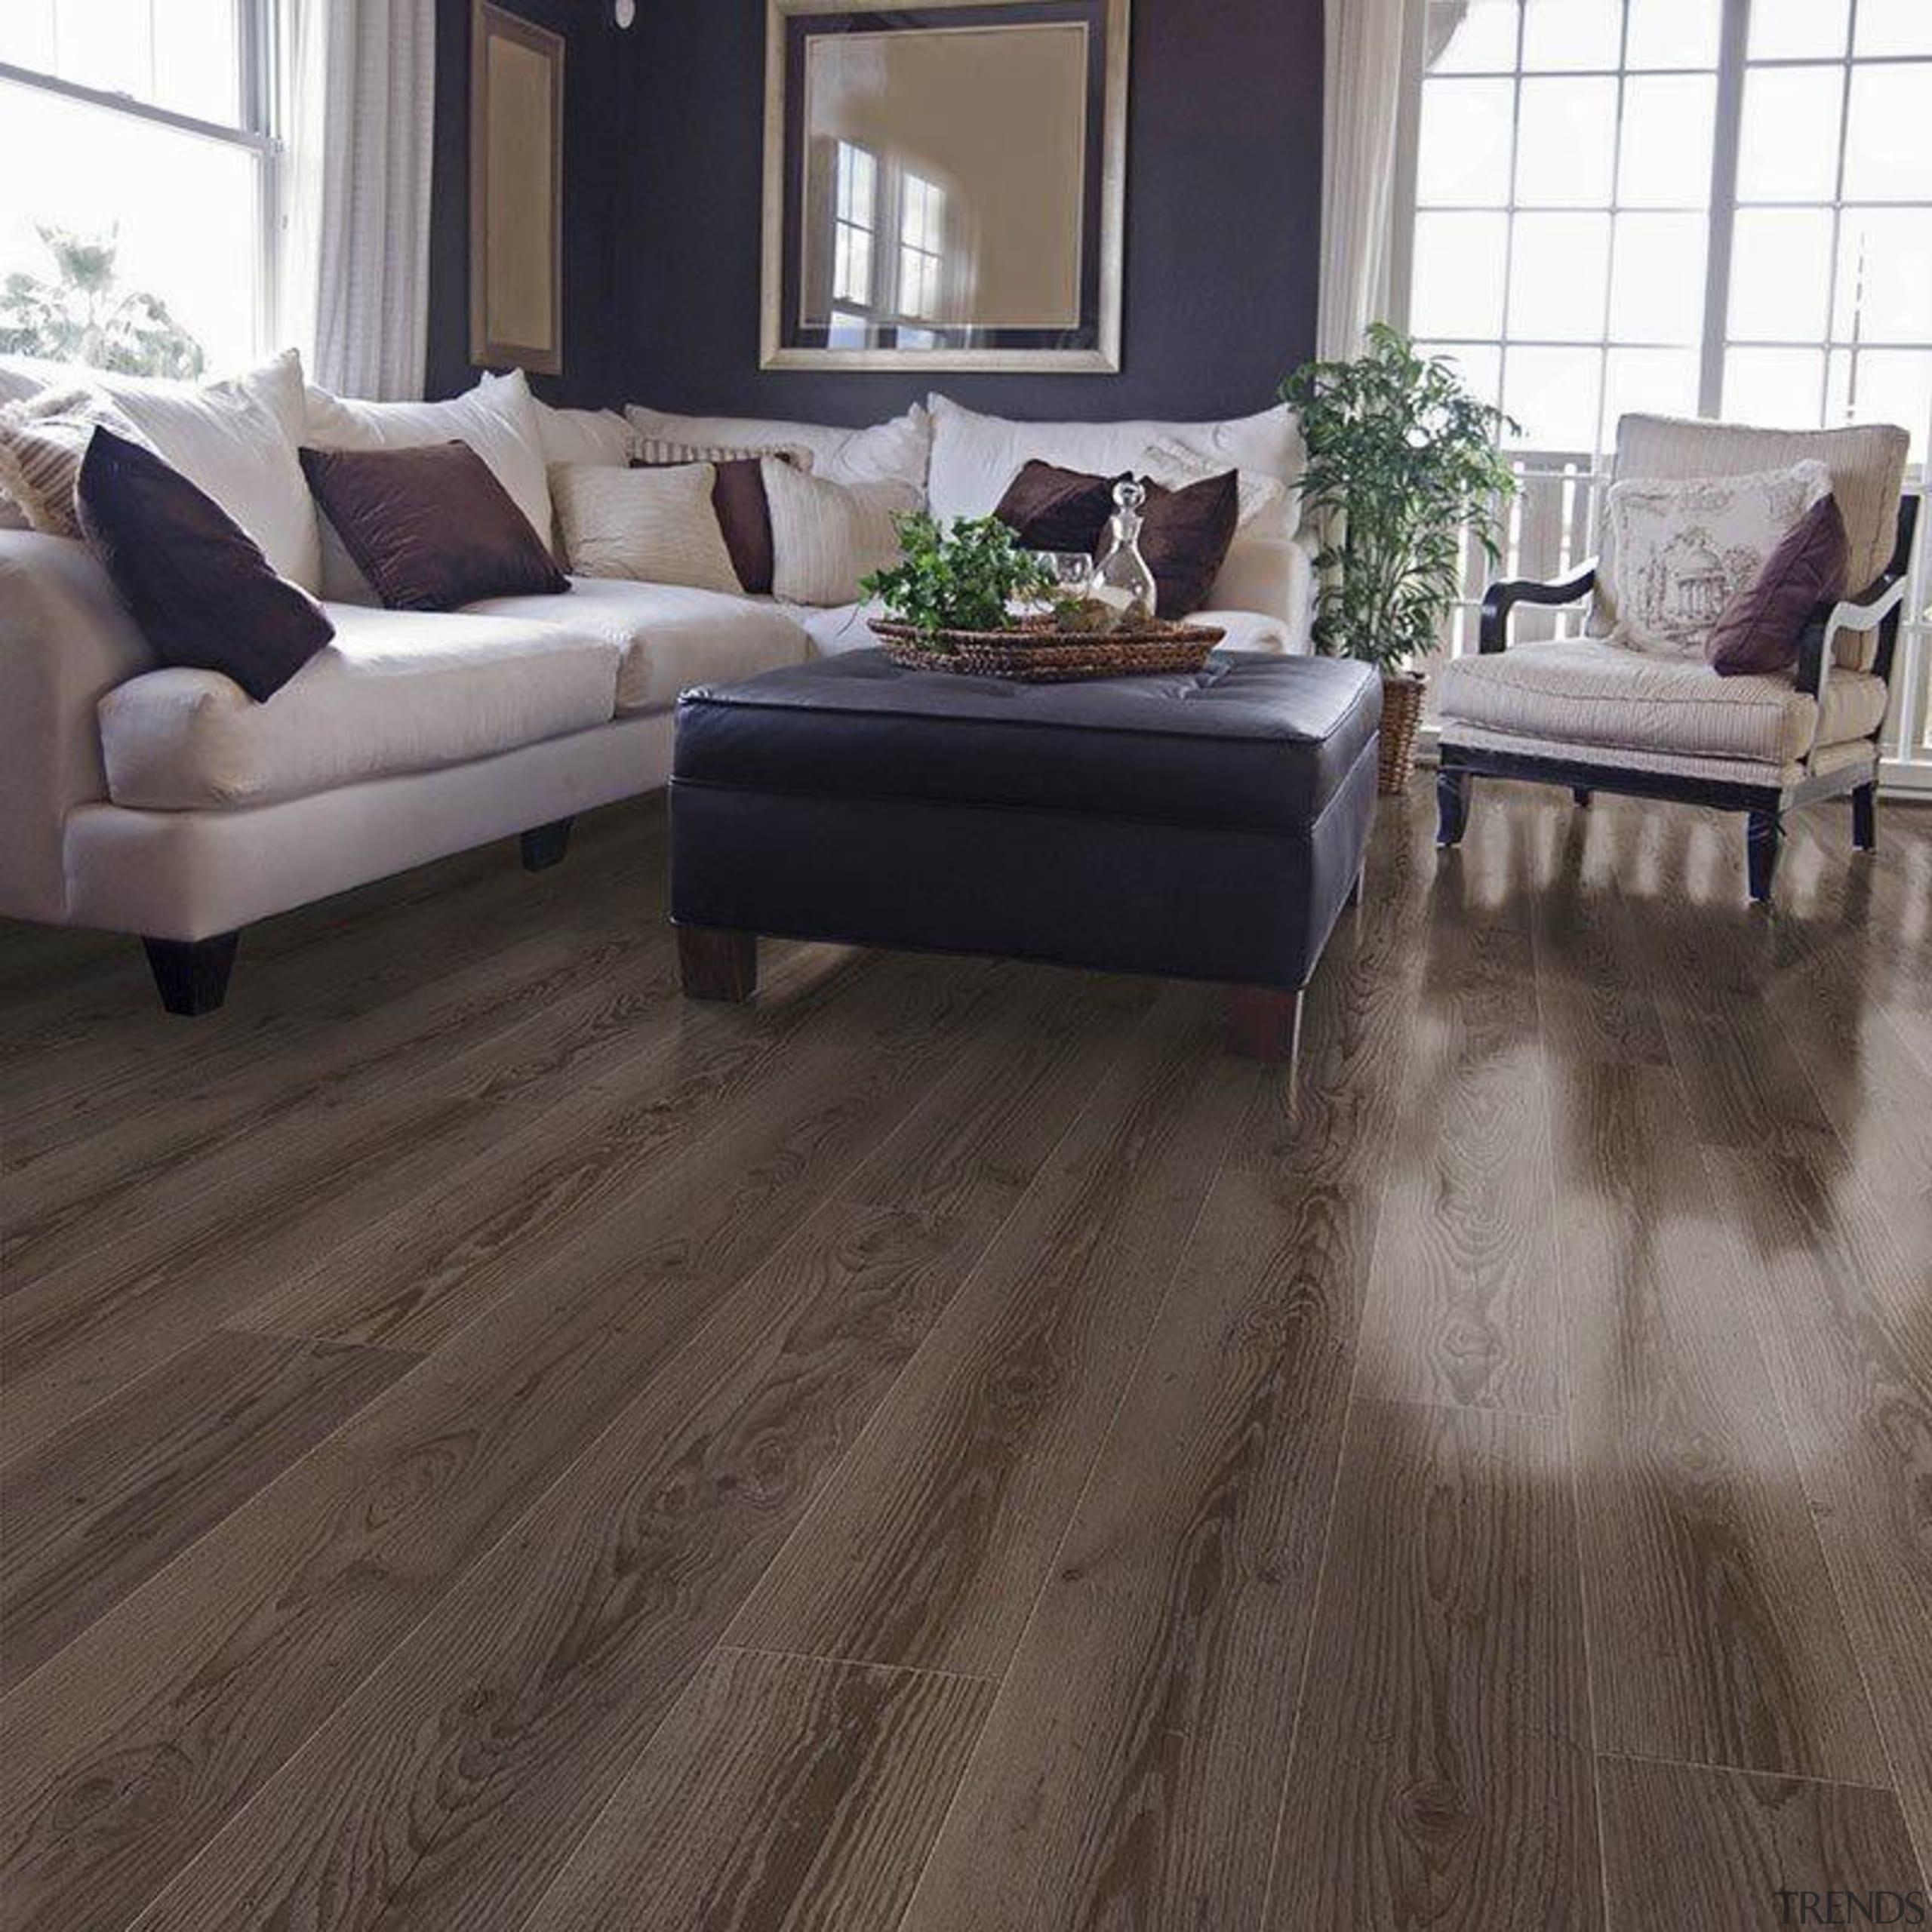 """Neo by Classen"" introduces a new generation floor, flooring, hardwood, home, interior design, laminate flooring, living room, tile, wood, wood flooring, gray, black"